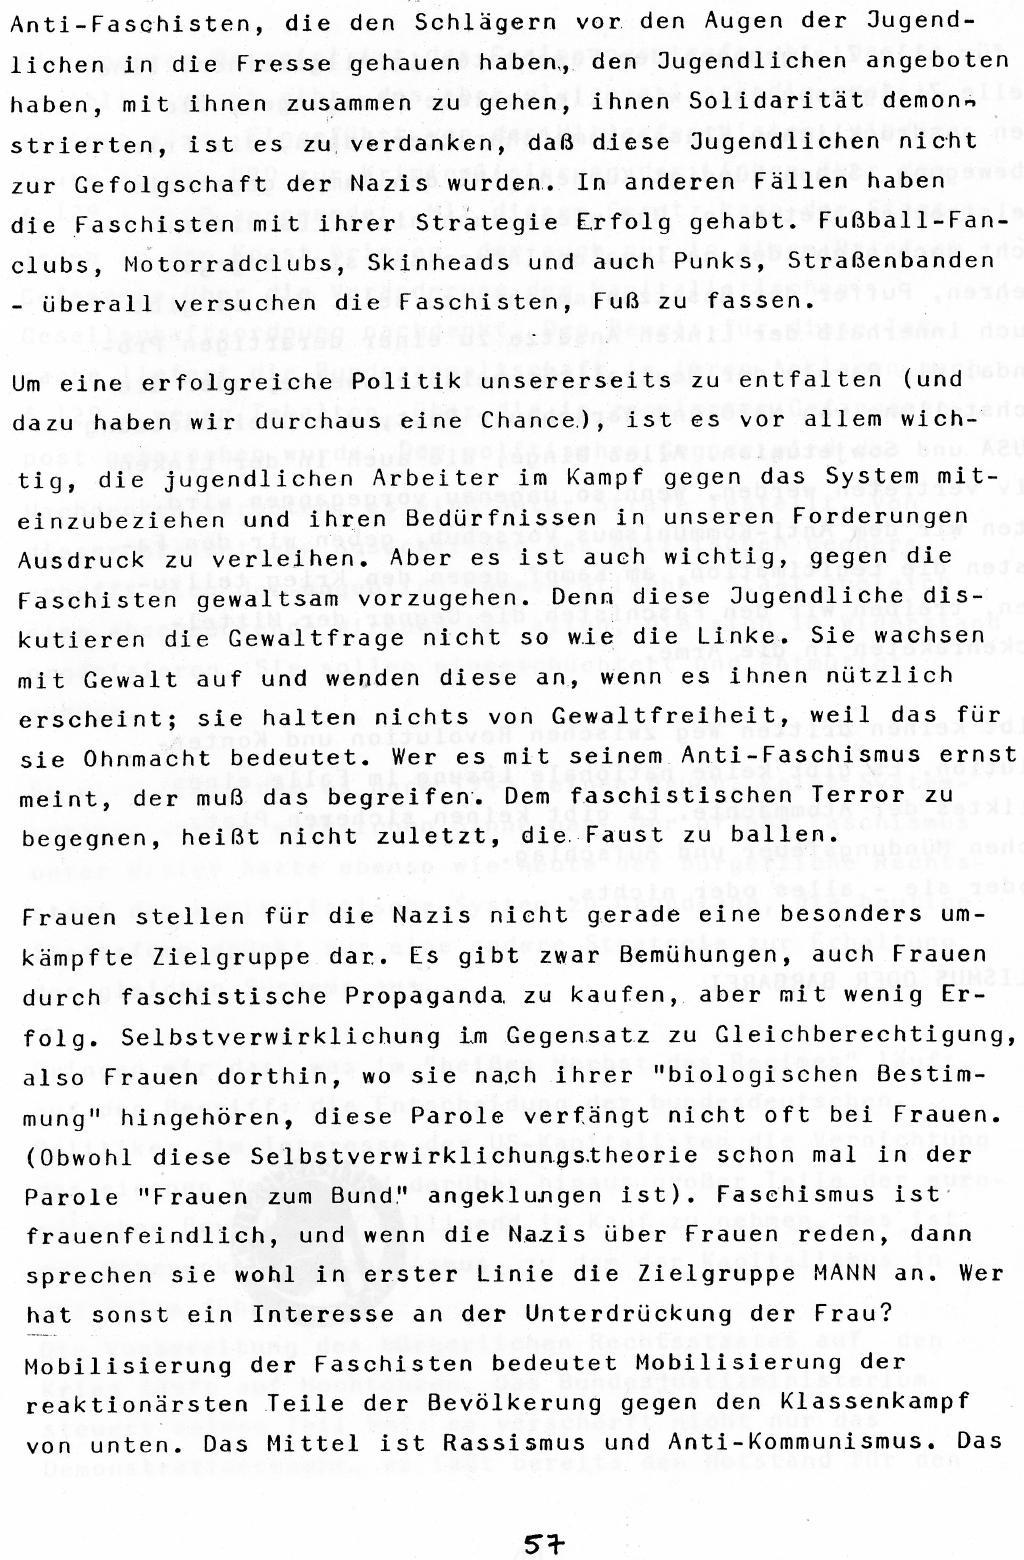 Berlin_1983_Autonome_Gruppen_Faschismus_im_Kapitalismus_57